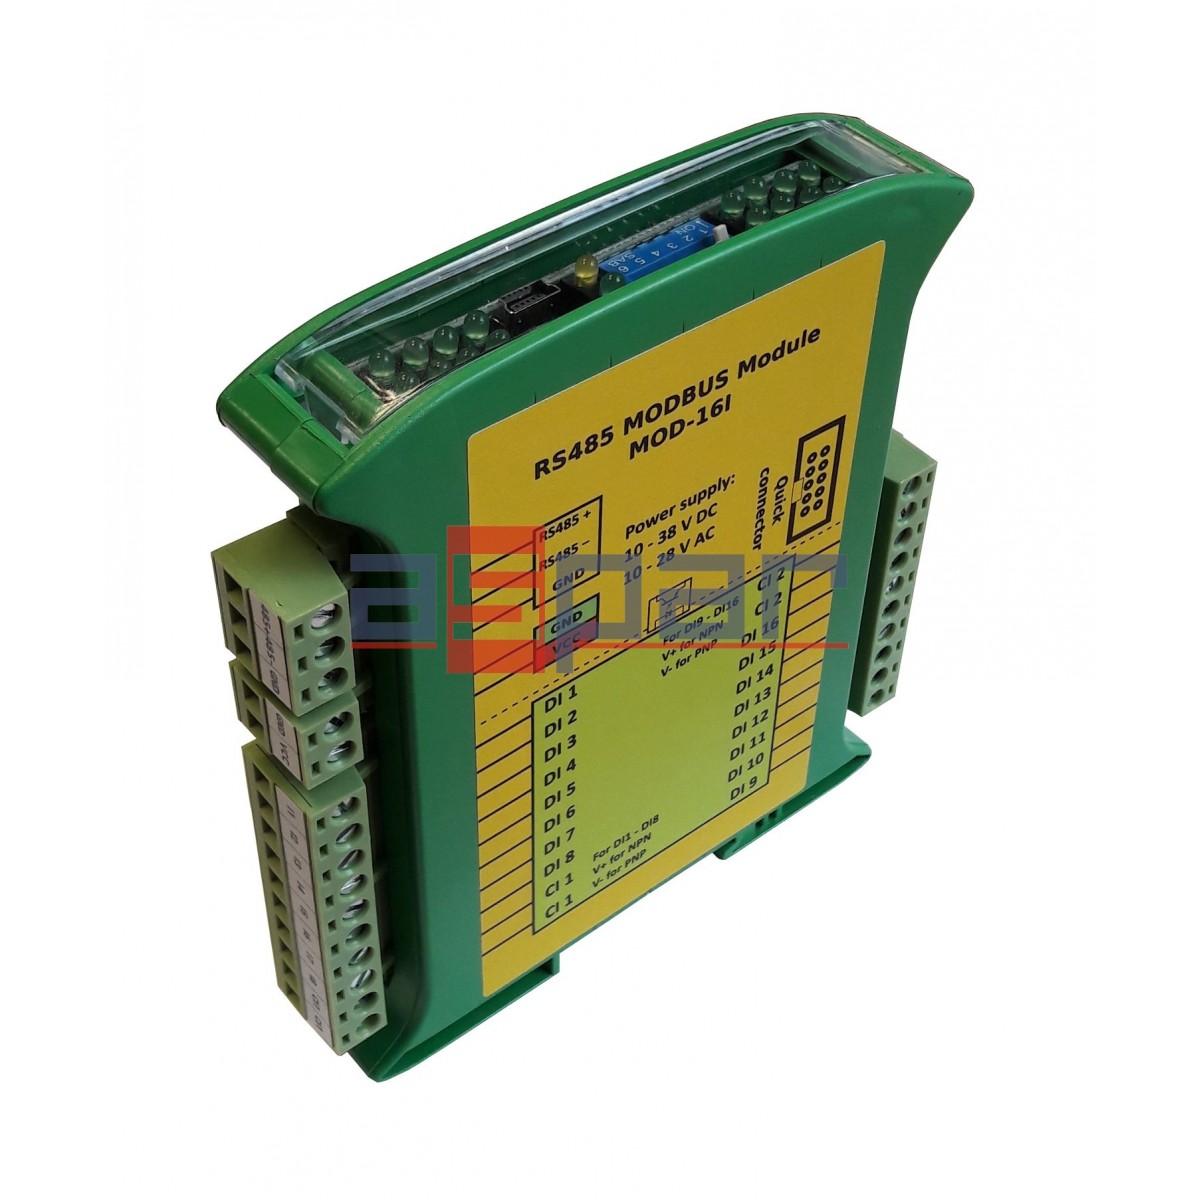 16 digital inputs, MOD-16I